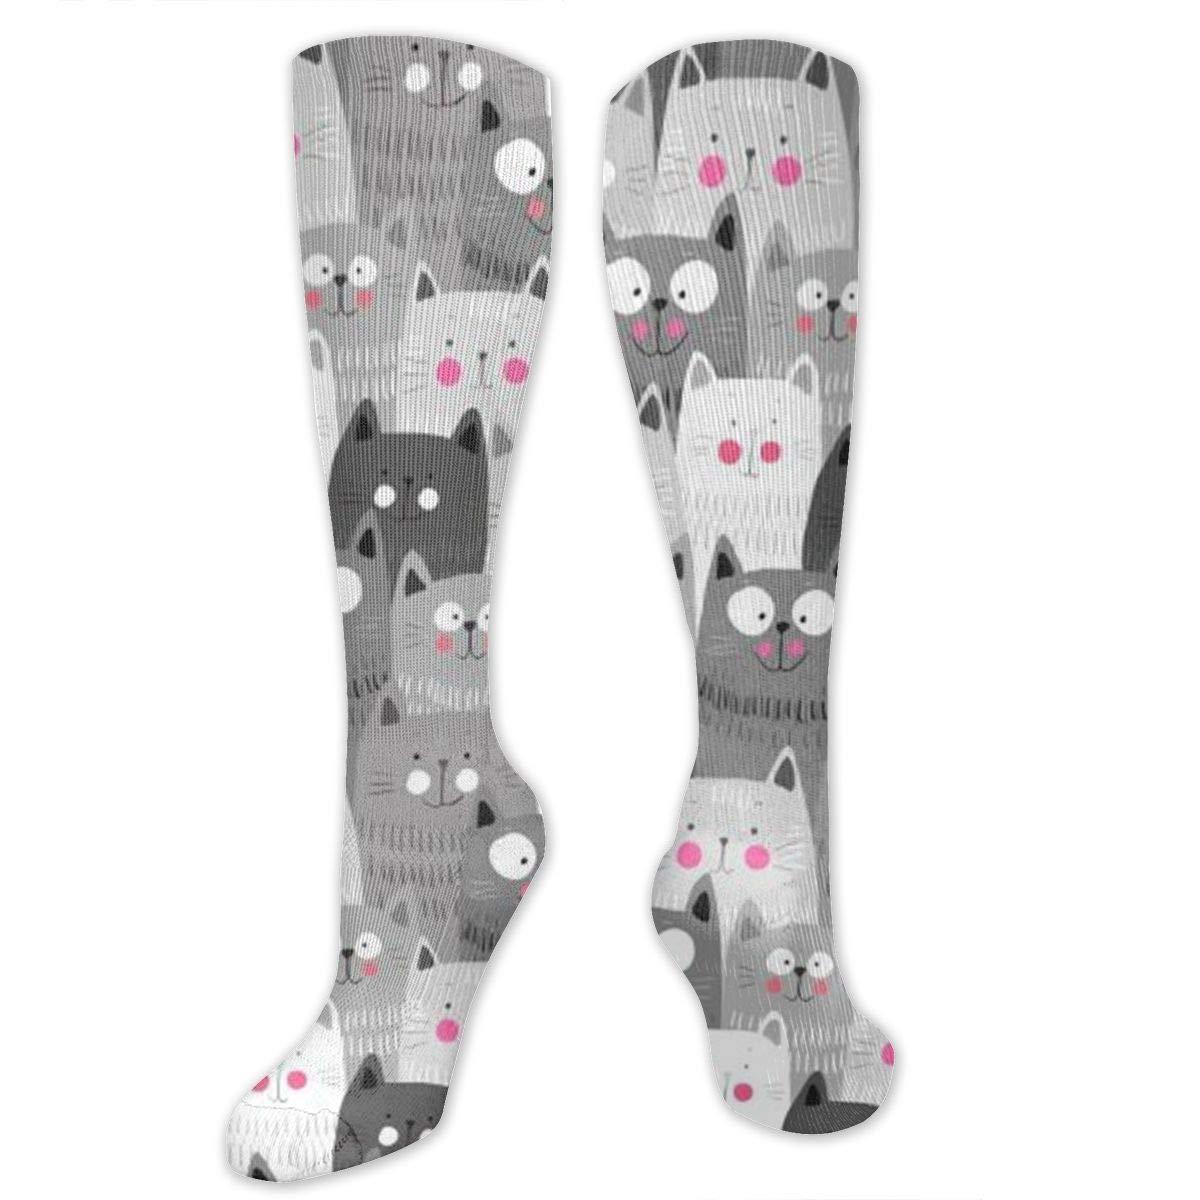 Chanwazibibiliu Cute Cats Mens Colorful Dress Socks Funky Men Multicolored Pattern Fashionable Fun Crew Cotton Socks